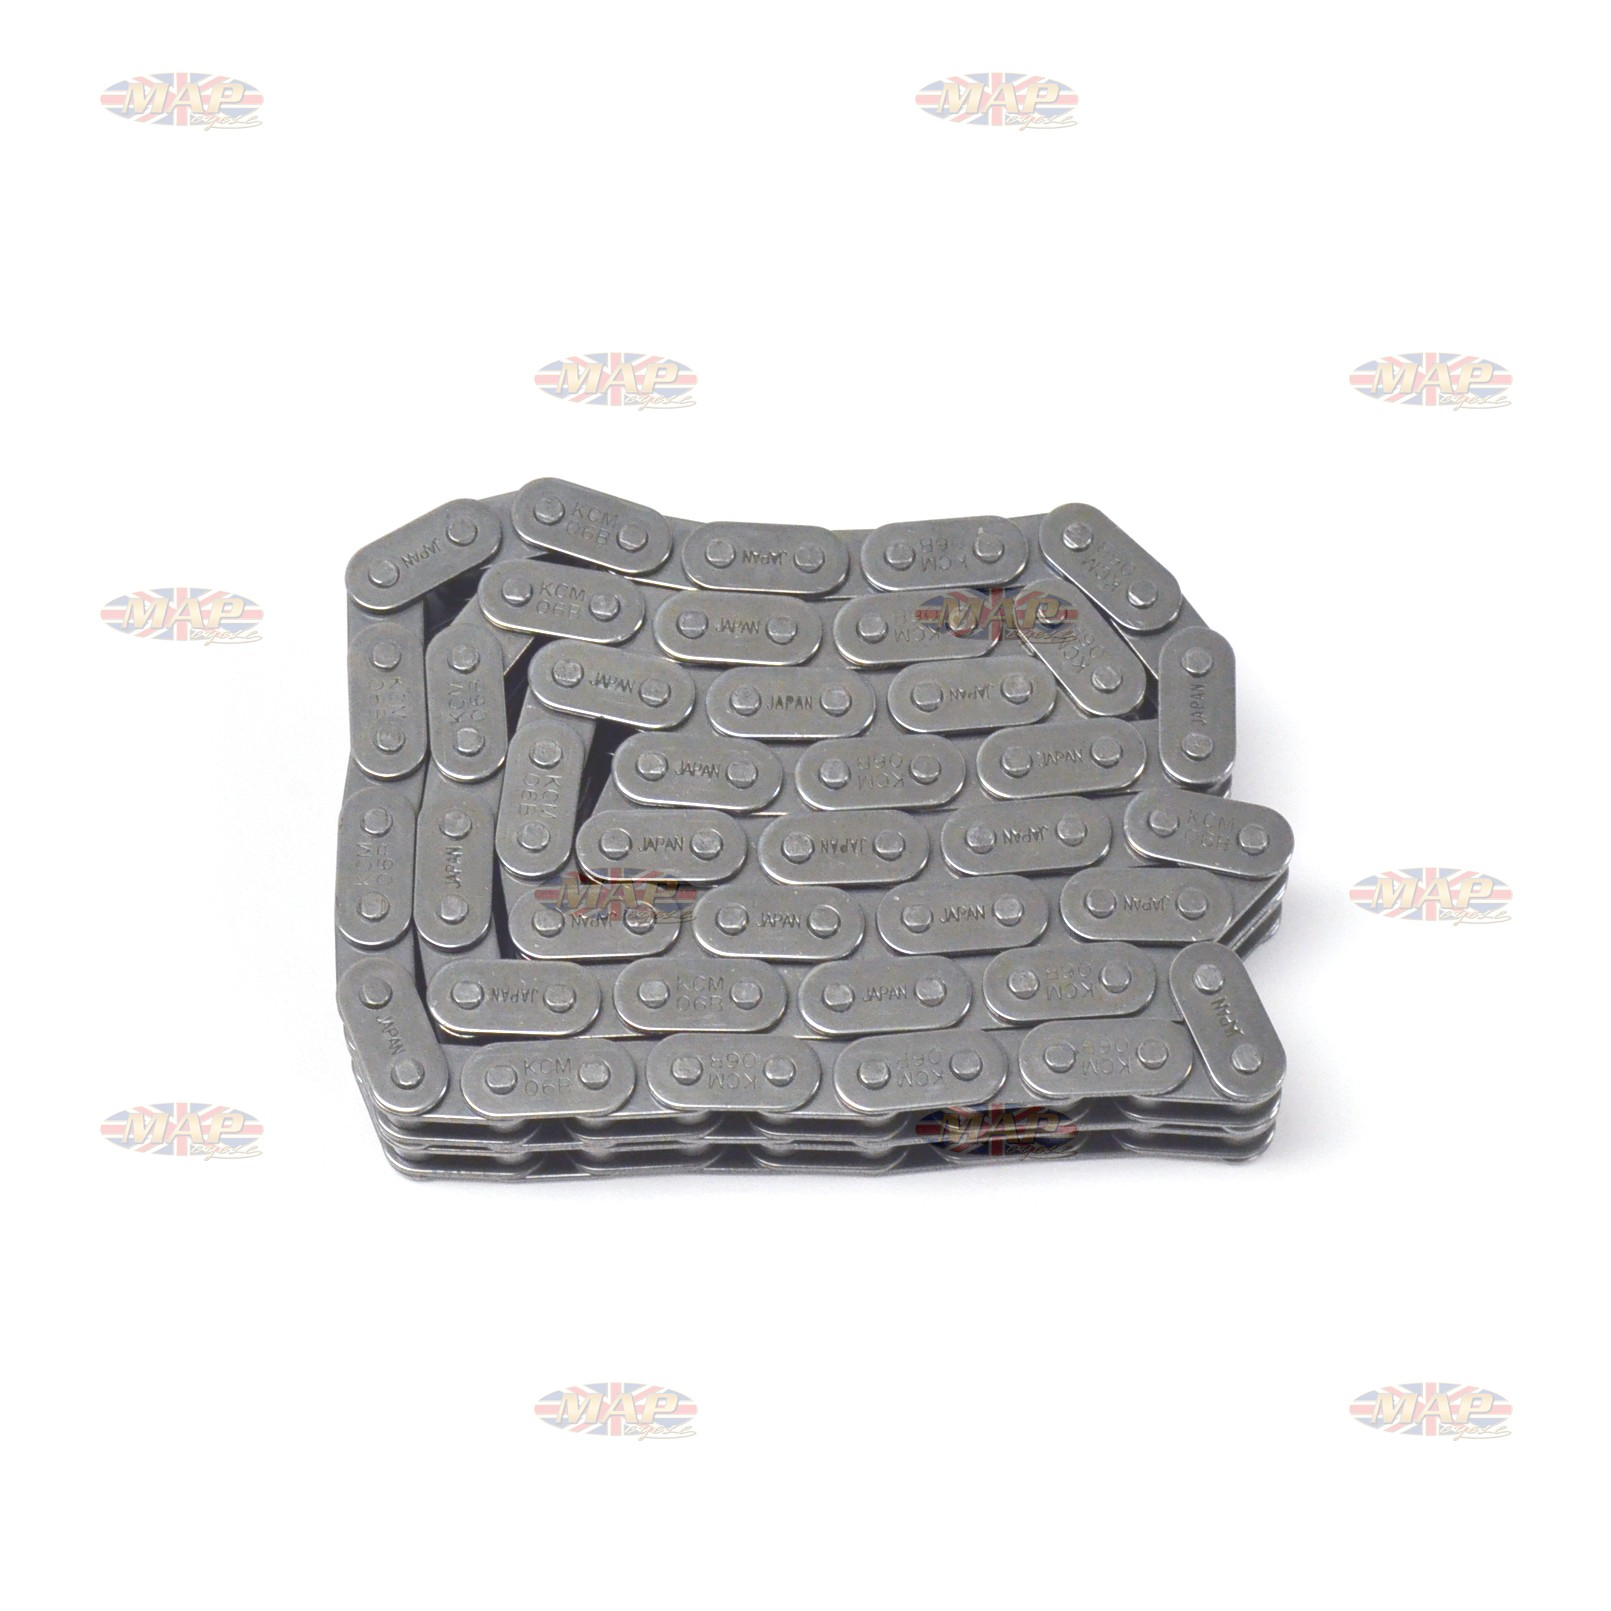 CHAIN/ PRIMARY/ 84L DUPLEX/ RENOLD ENDLS 60-0477